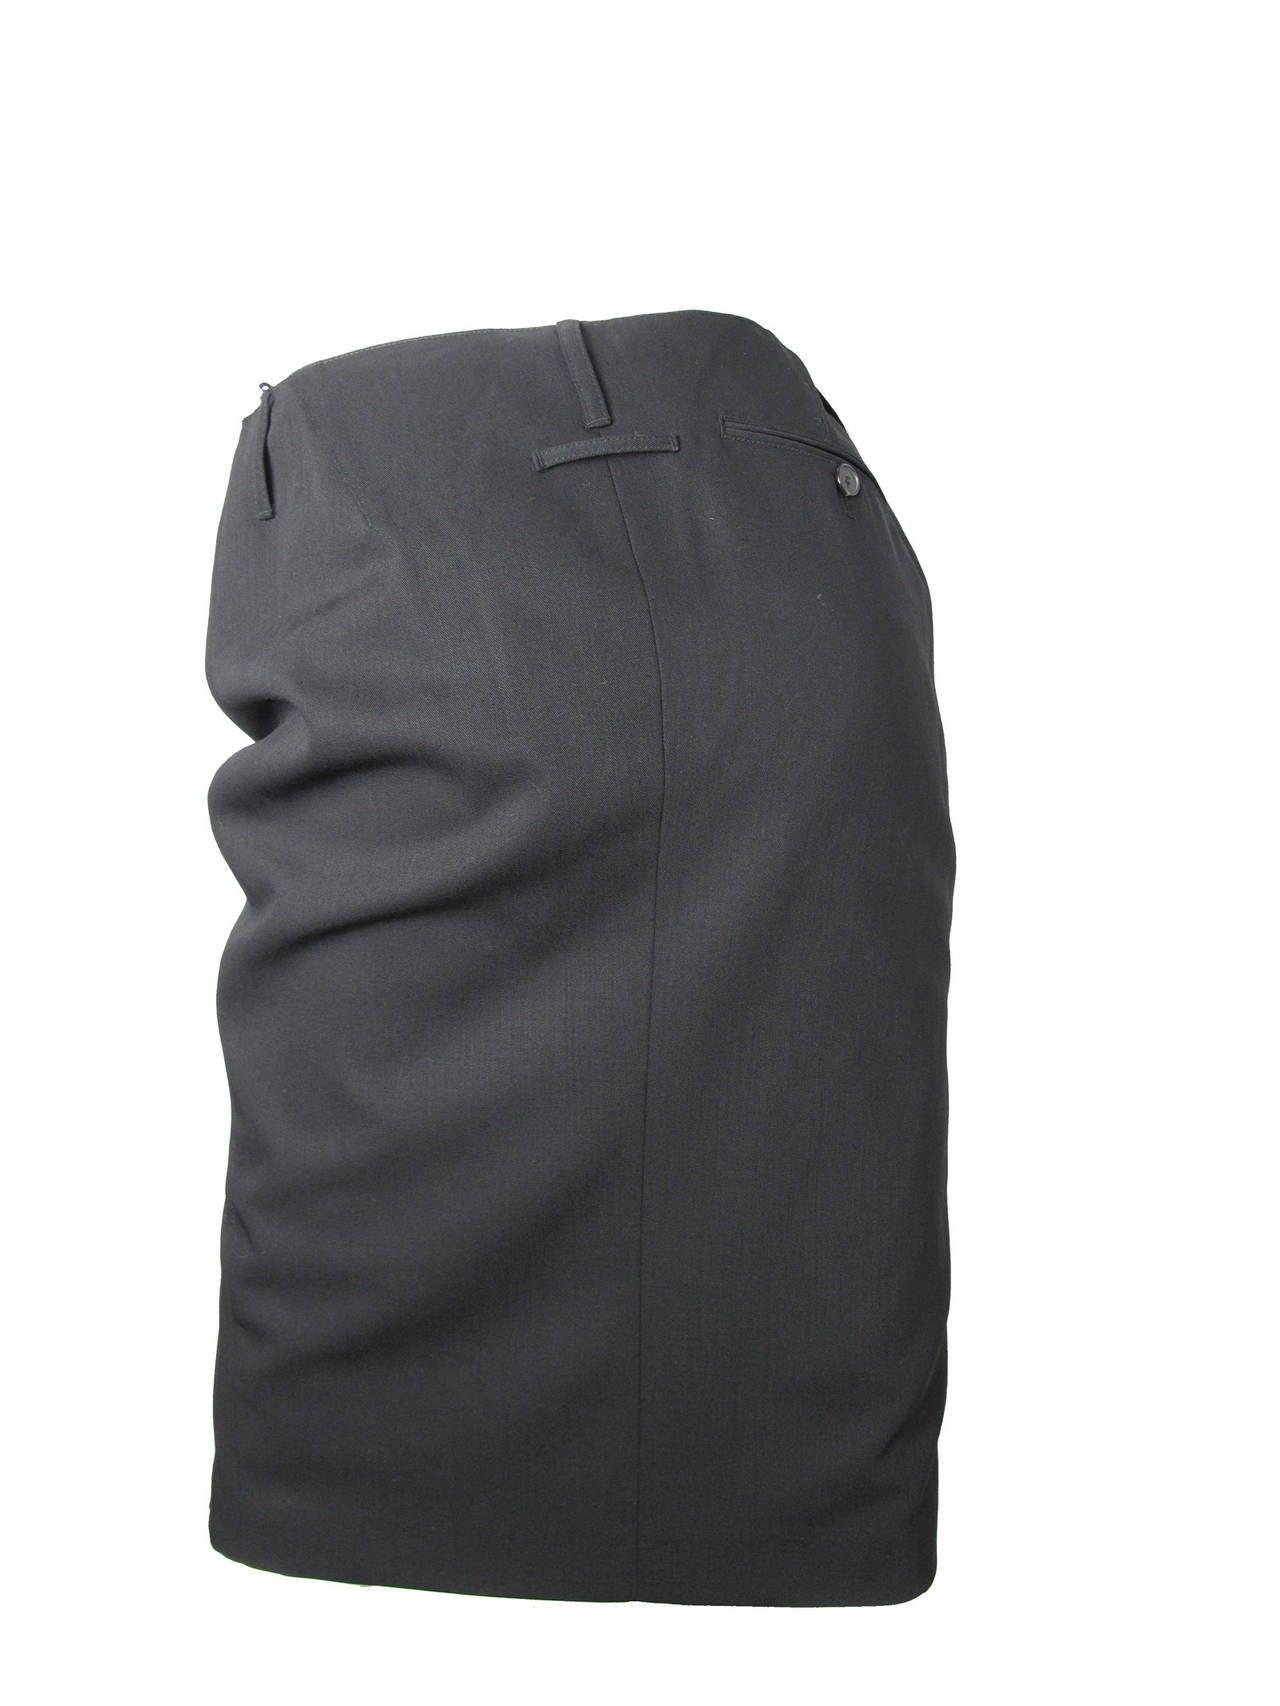 Jean Paul Gaultier black pencil skirt, lace slip 2